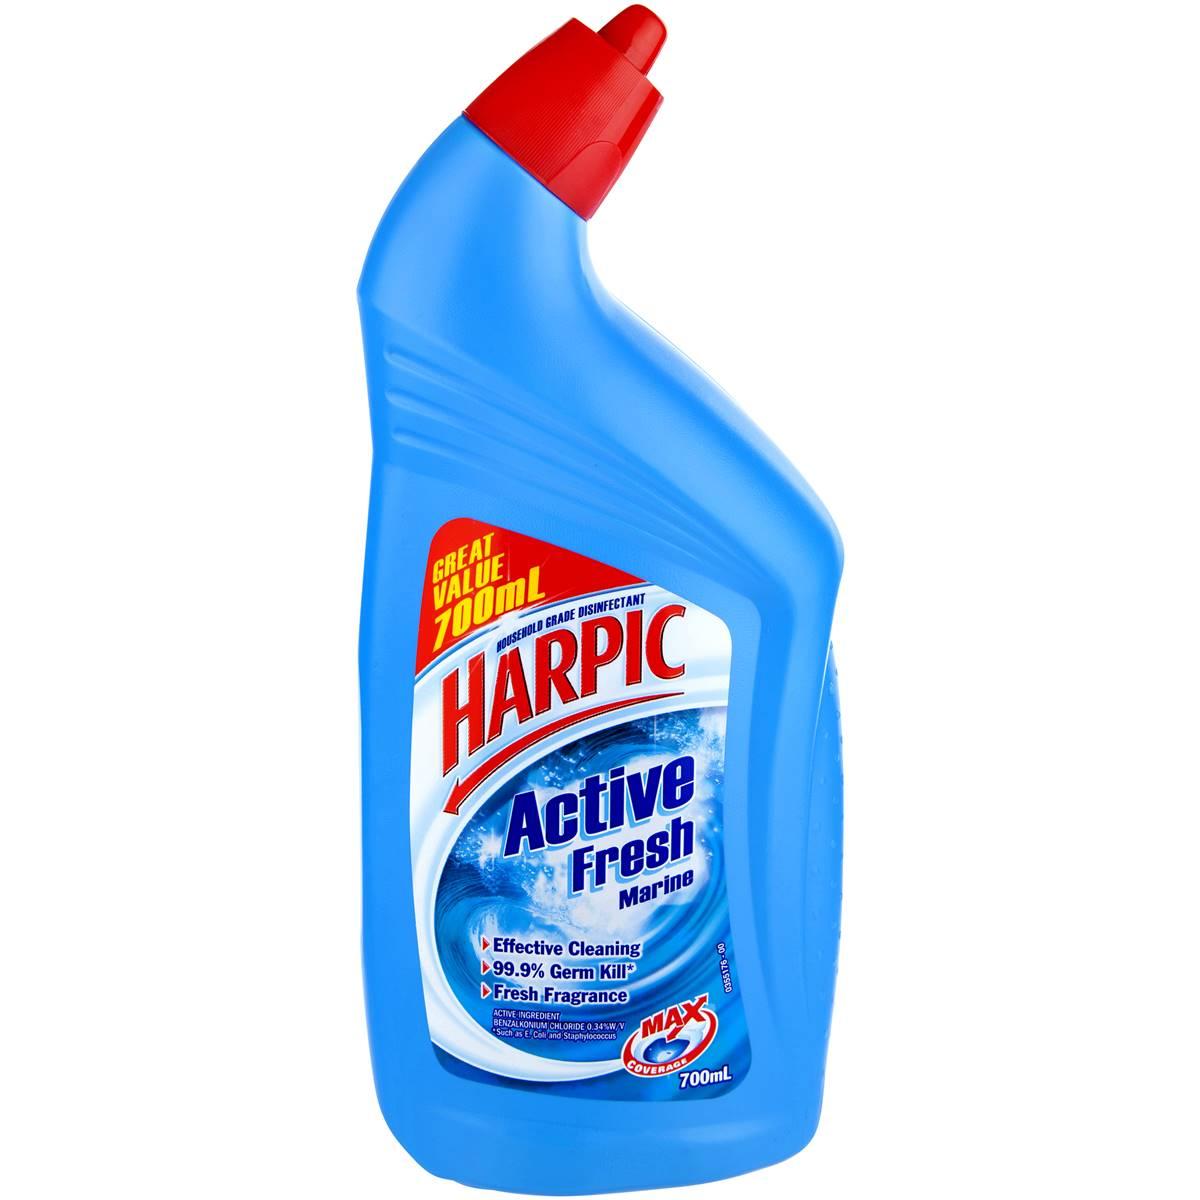 harpic active toilet cleaner marine